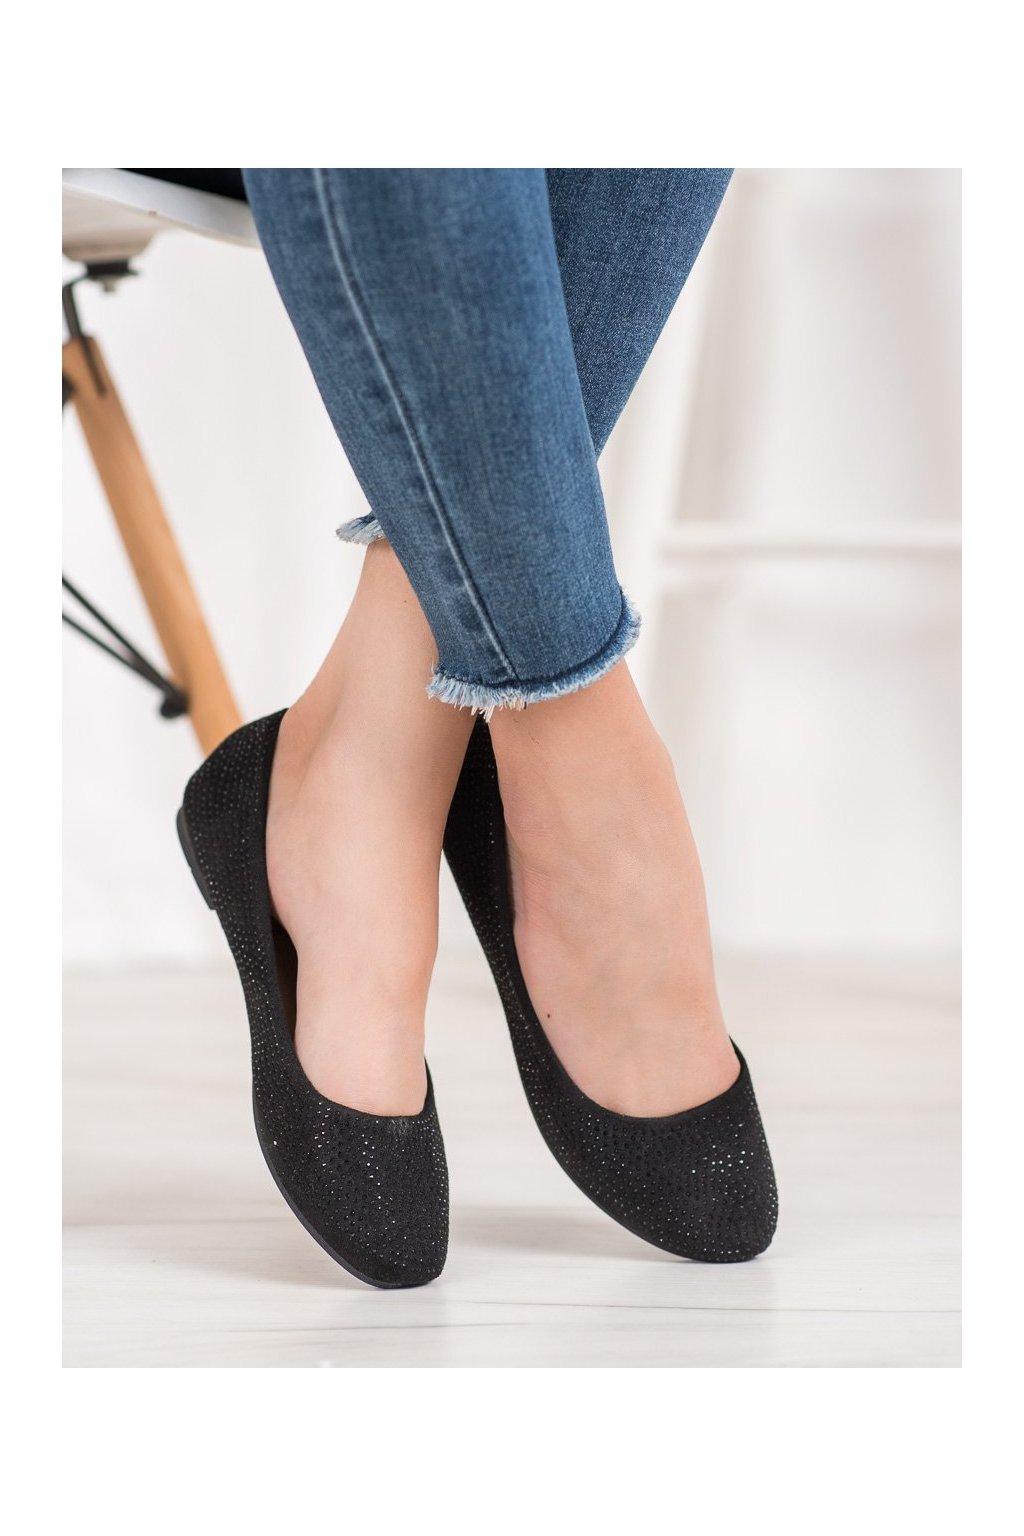 Čierne topánky Diamantique kod 9988-12B